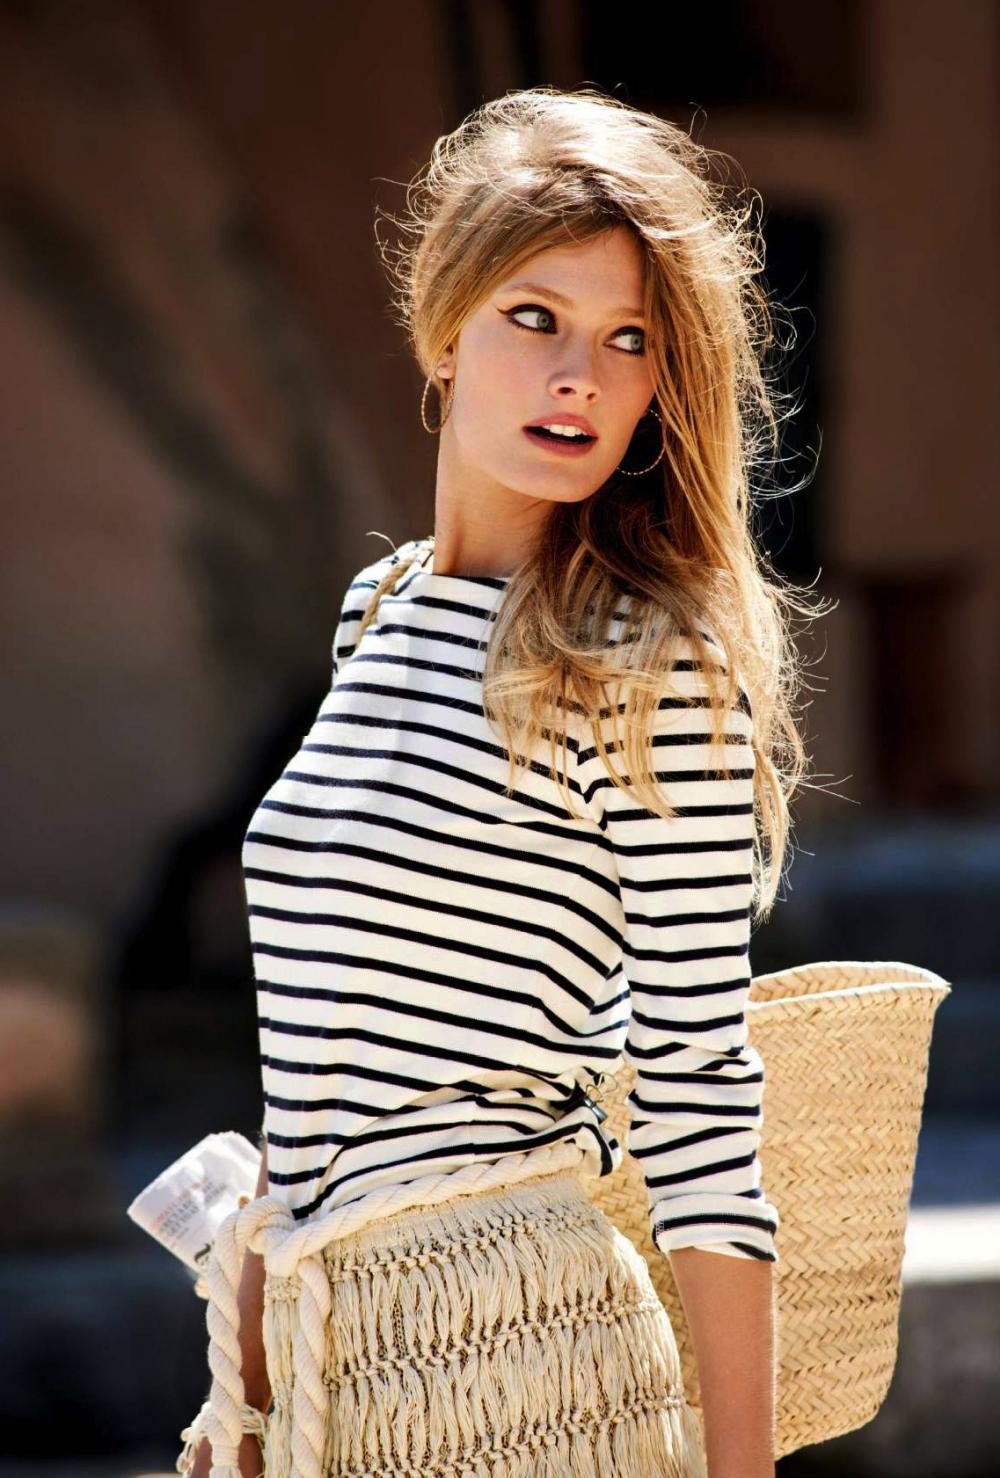 Gigi Paris by Maximillian Menacher | Fashion, Editorial